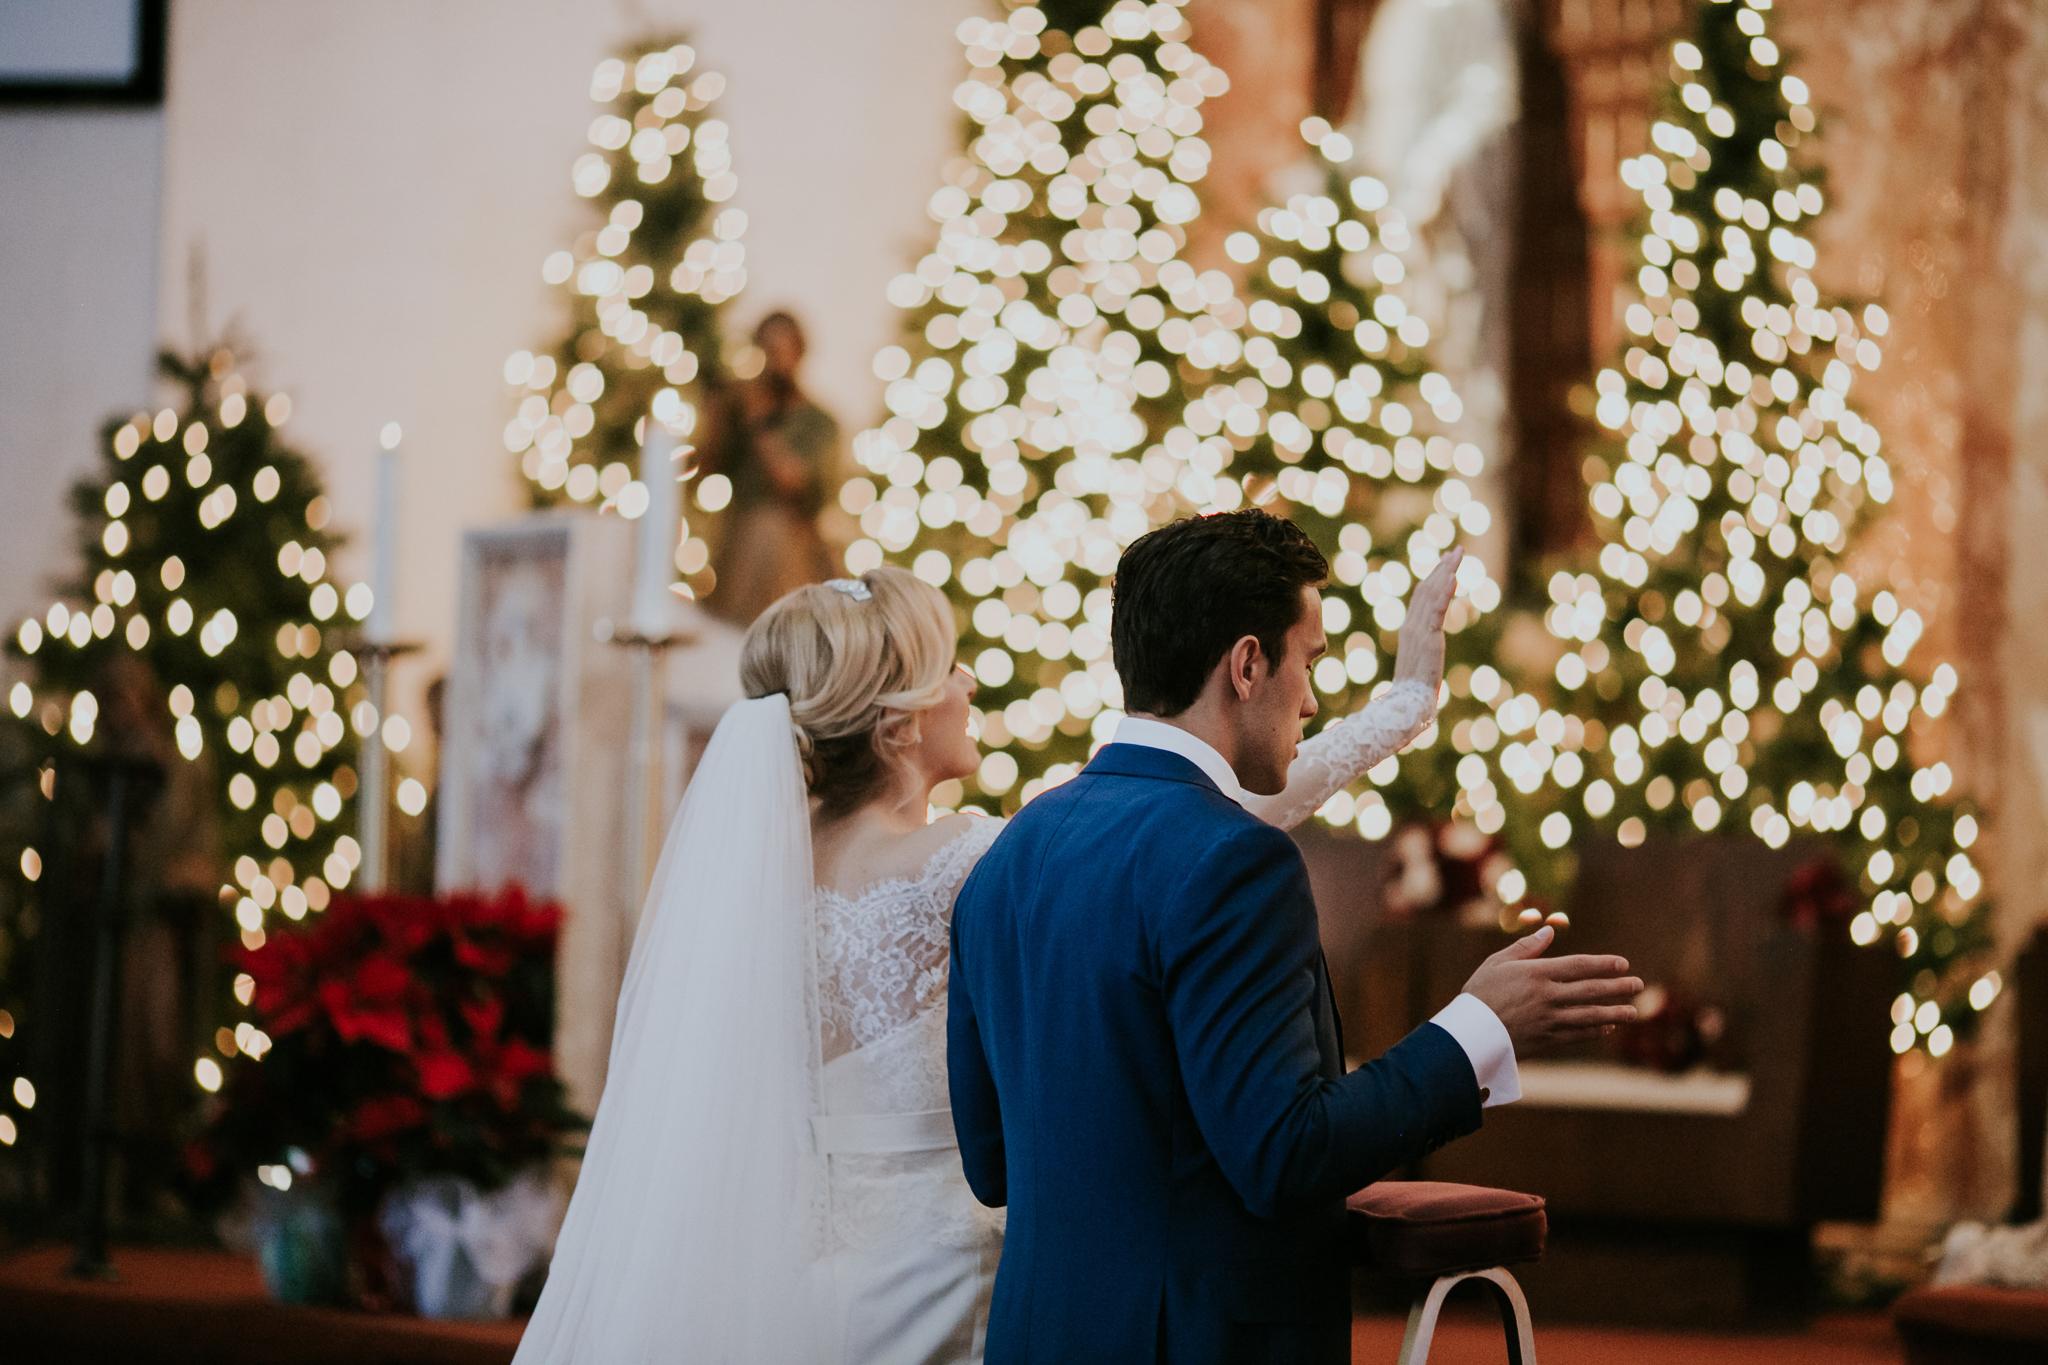 20151230_hussem_wedding_0552_web.jpg